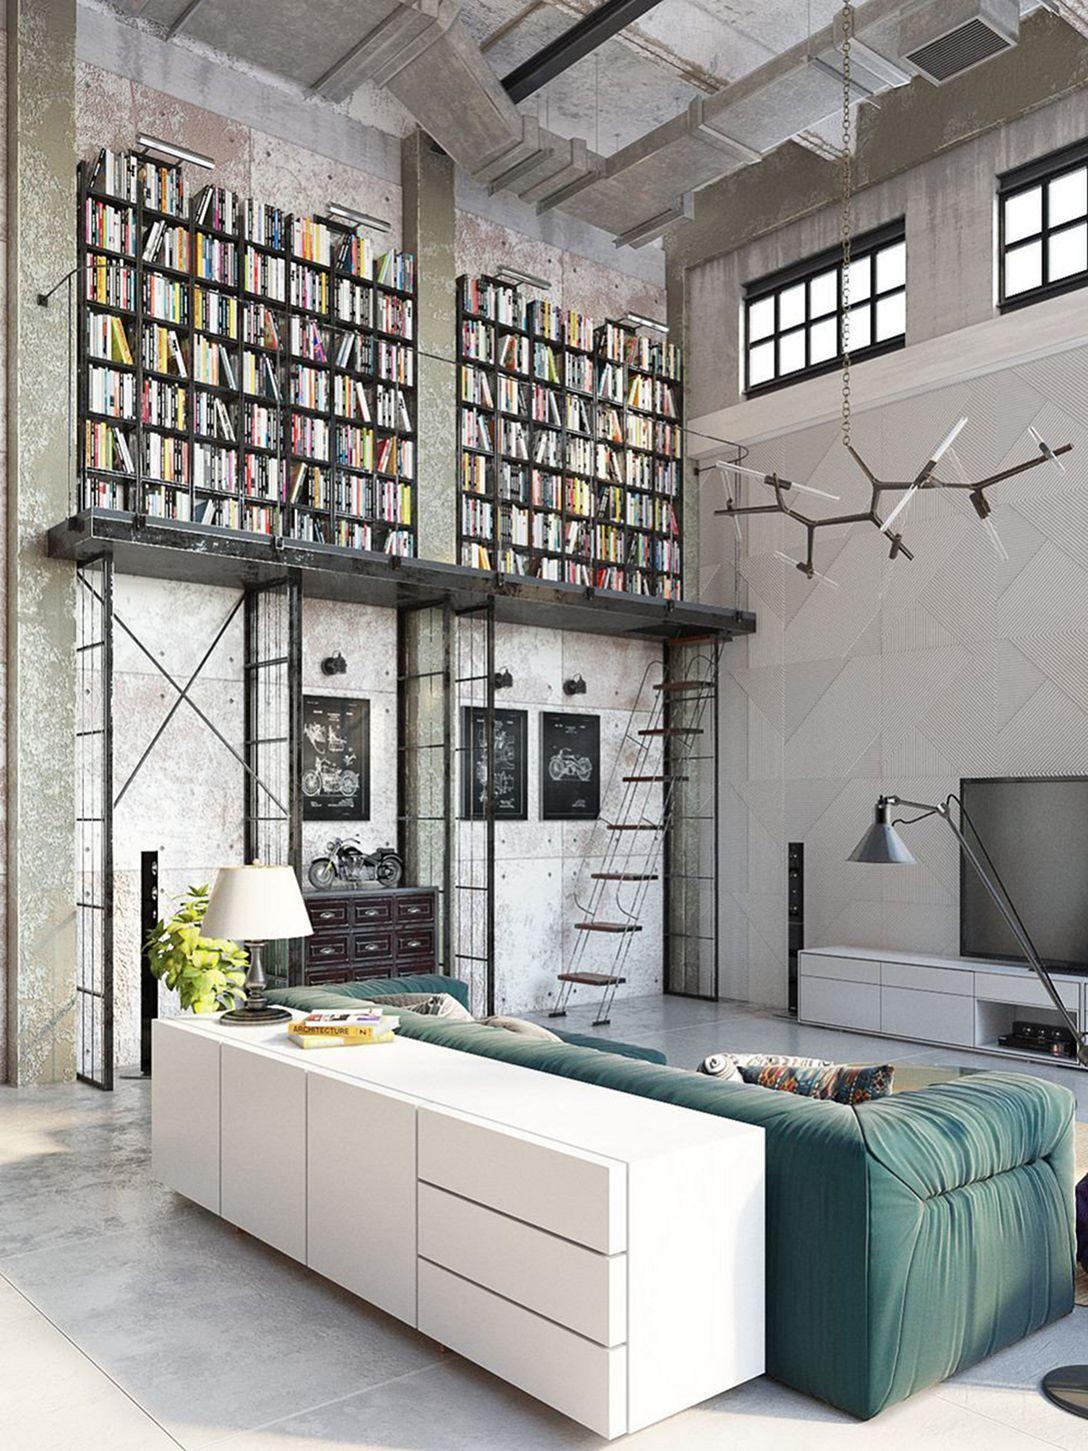 5 Awesome Modern Interior Design Ideas Loft Interior Design Loft Interiors Loft Design